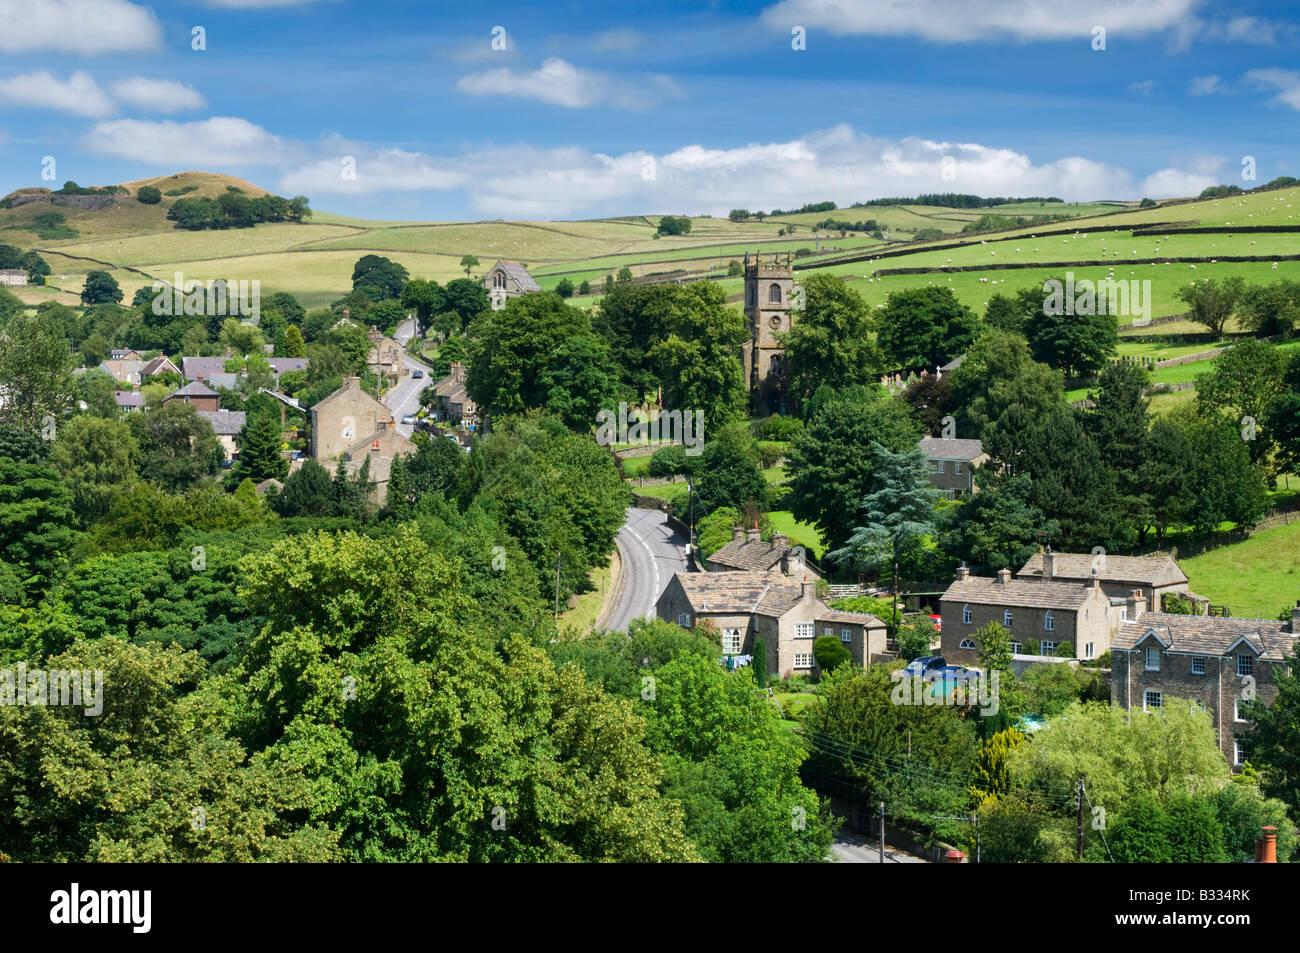 Village of Rainow in Summer, Peak District National Park, Cheshire, England, UK - Stock Image